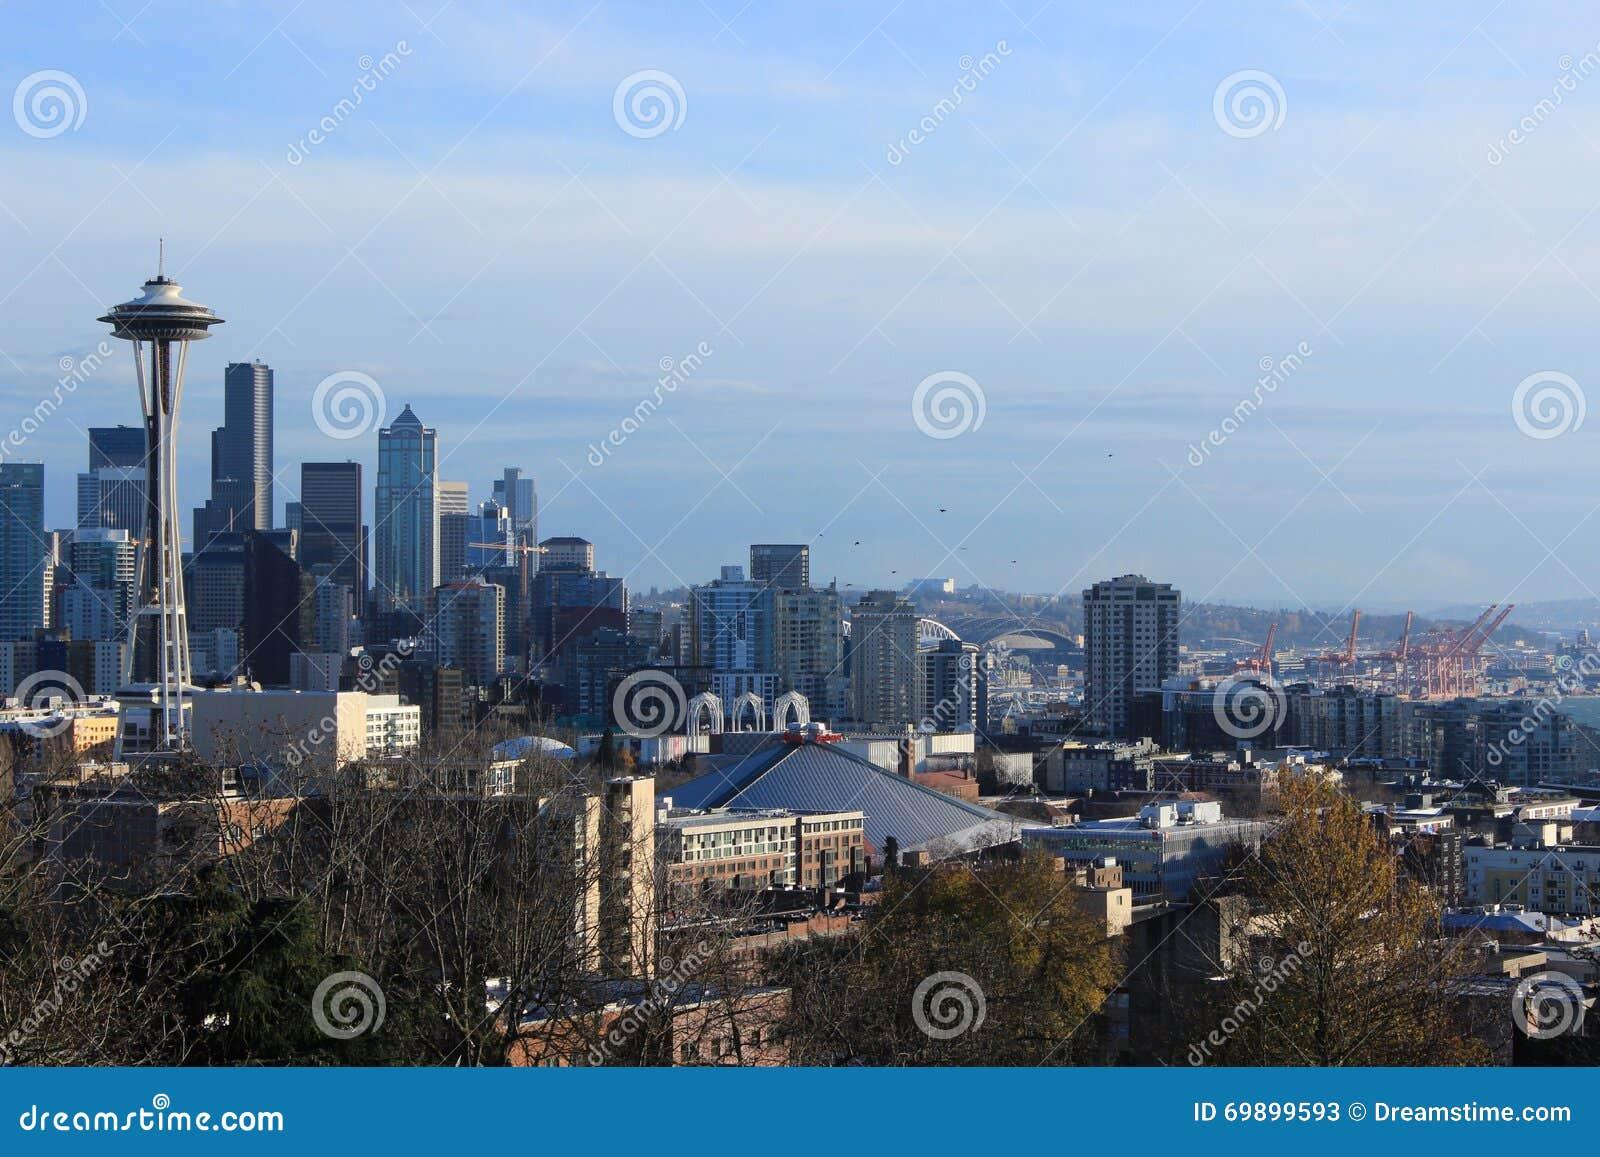 Горизонт города Сиэтл